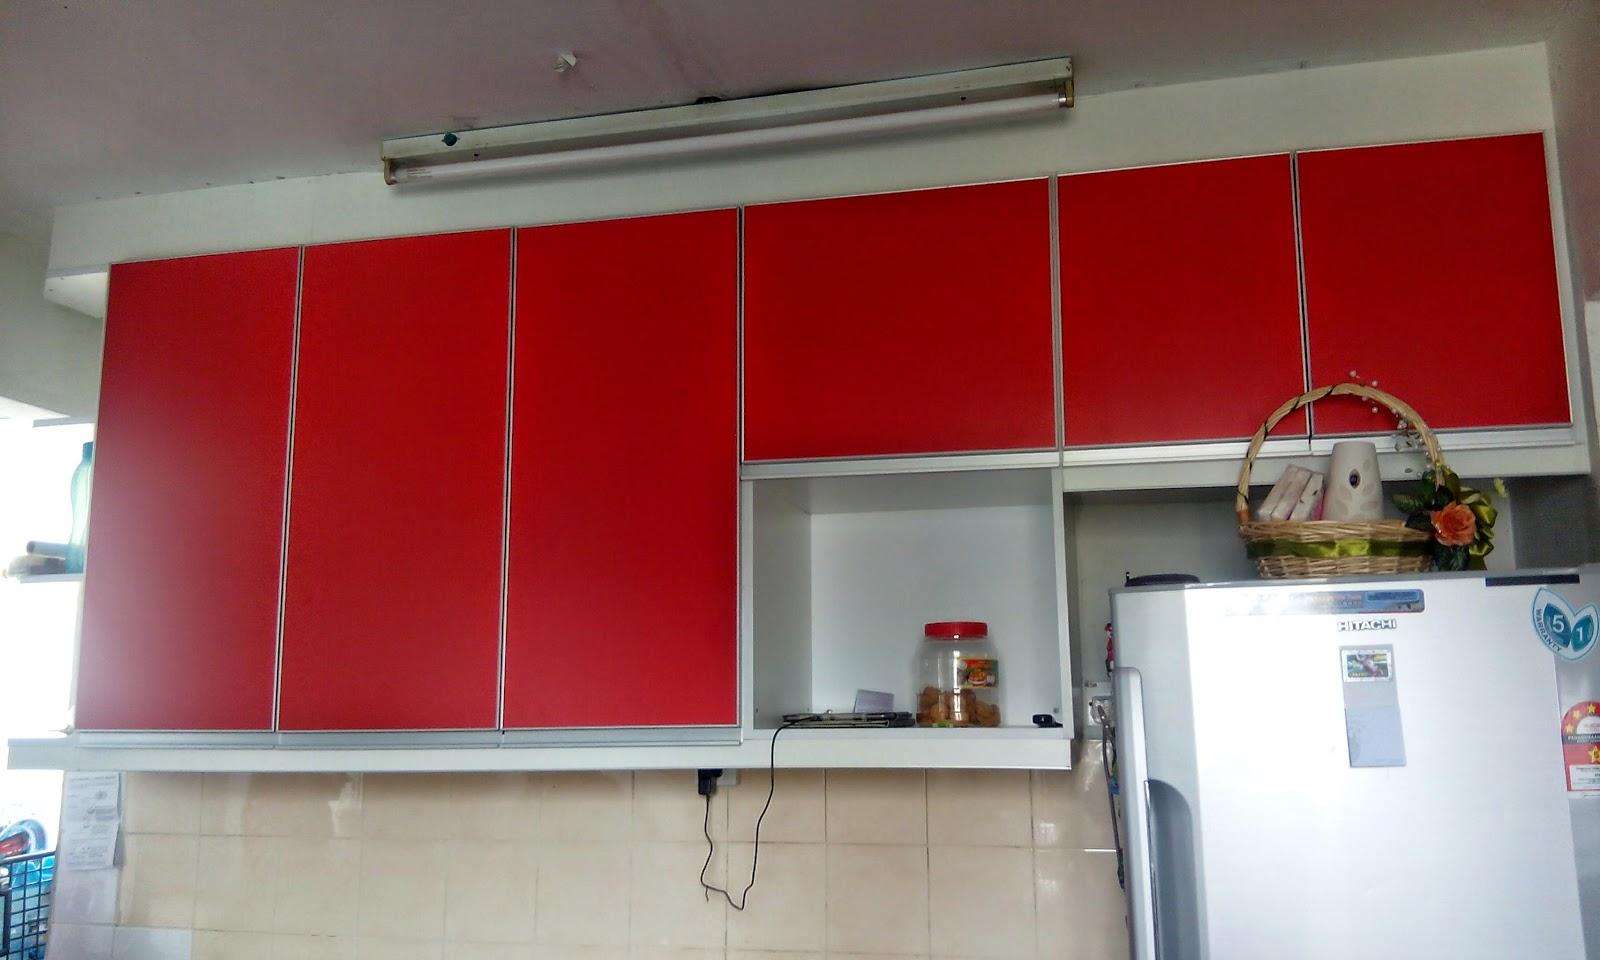 Dgn Menggunakan Material Milamine Board Kaler Merah Memang Kelihatan Agak Simple Tp Manarik